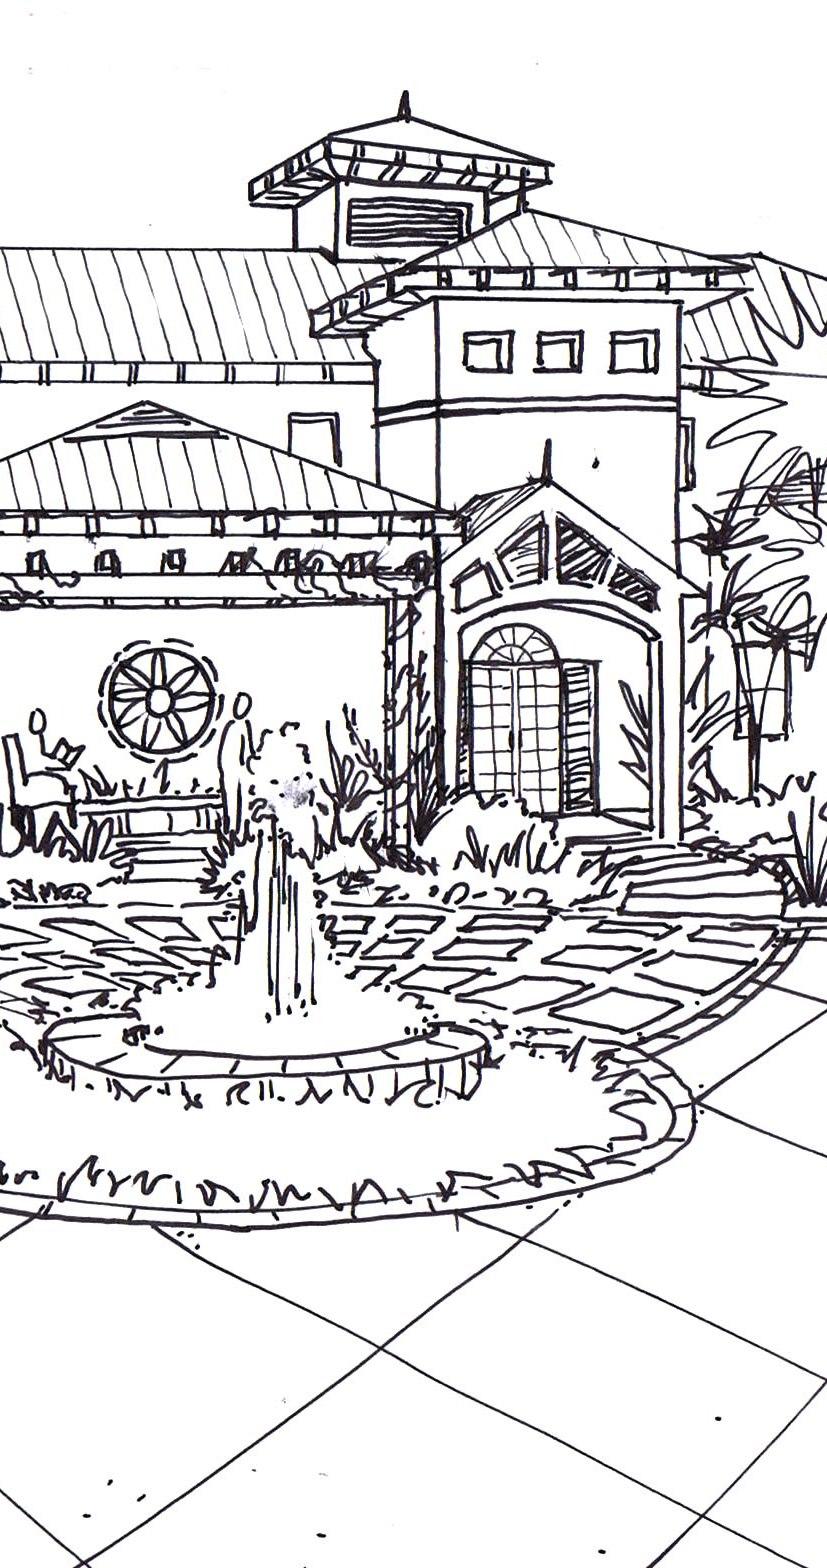 FPR3_BW_Sketch_Arrival Court B_032912_crop2.jpg